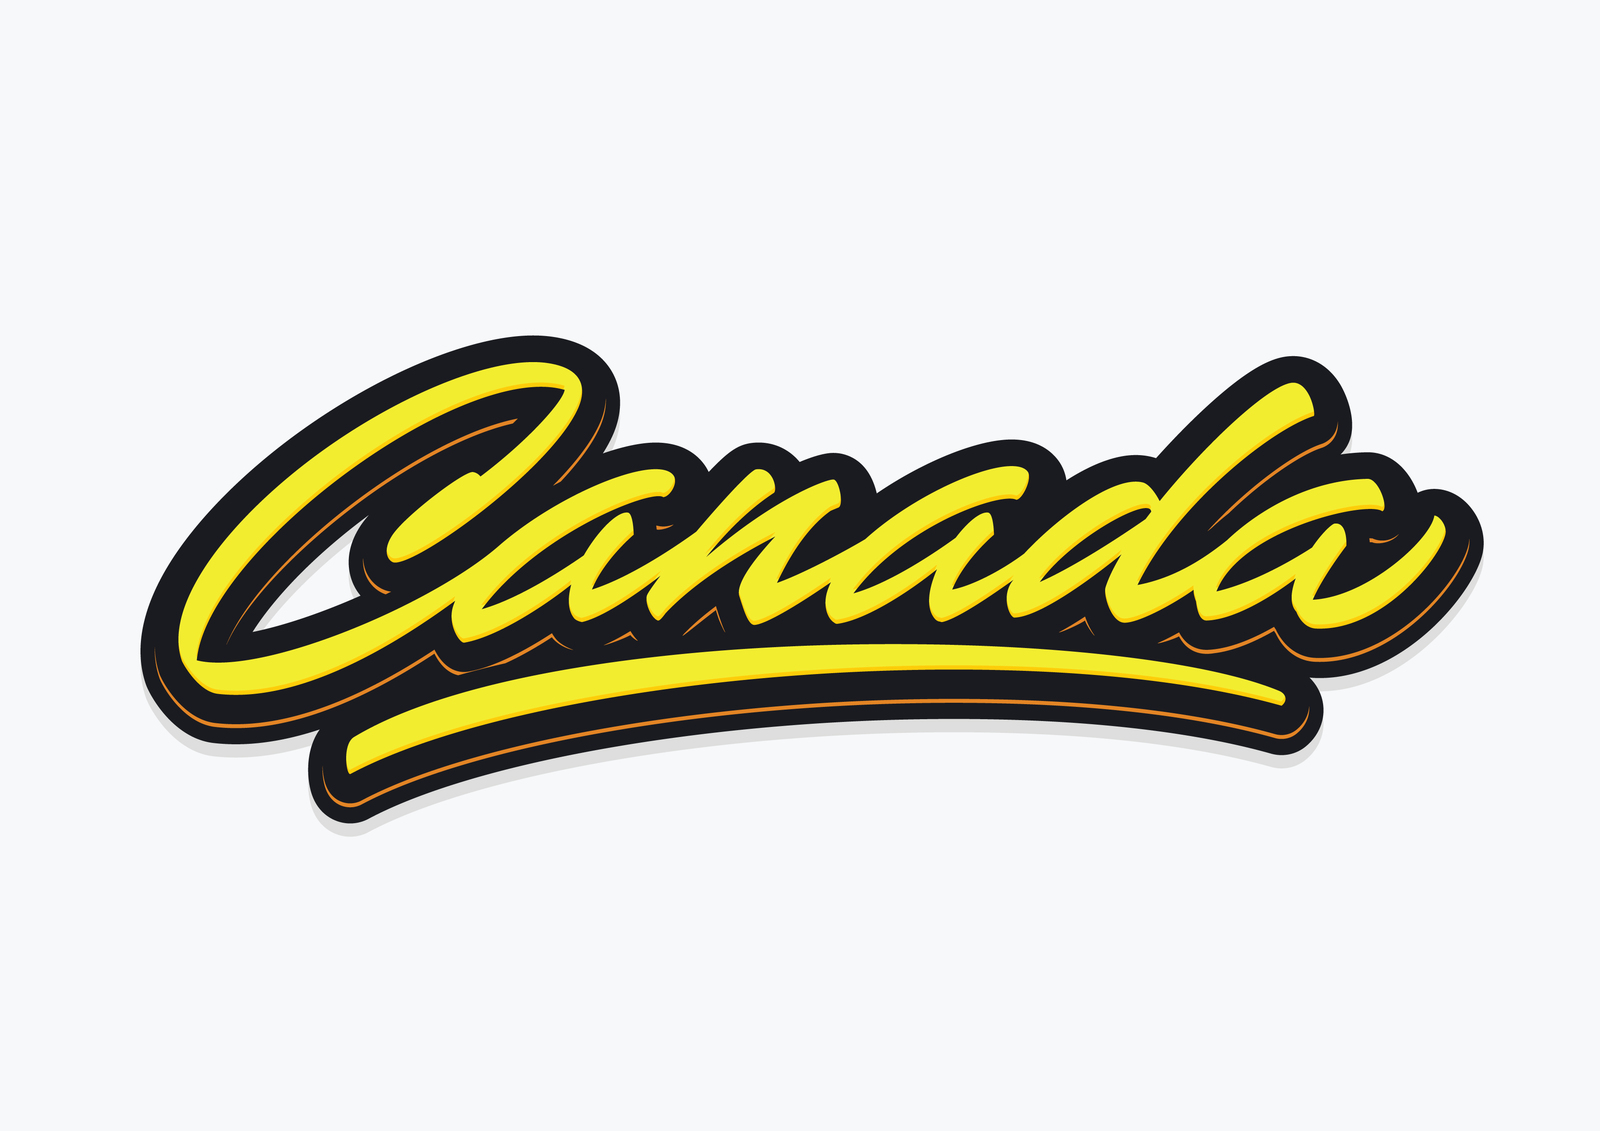 Canada brush sccript vector lettering